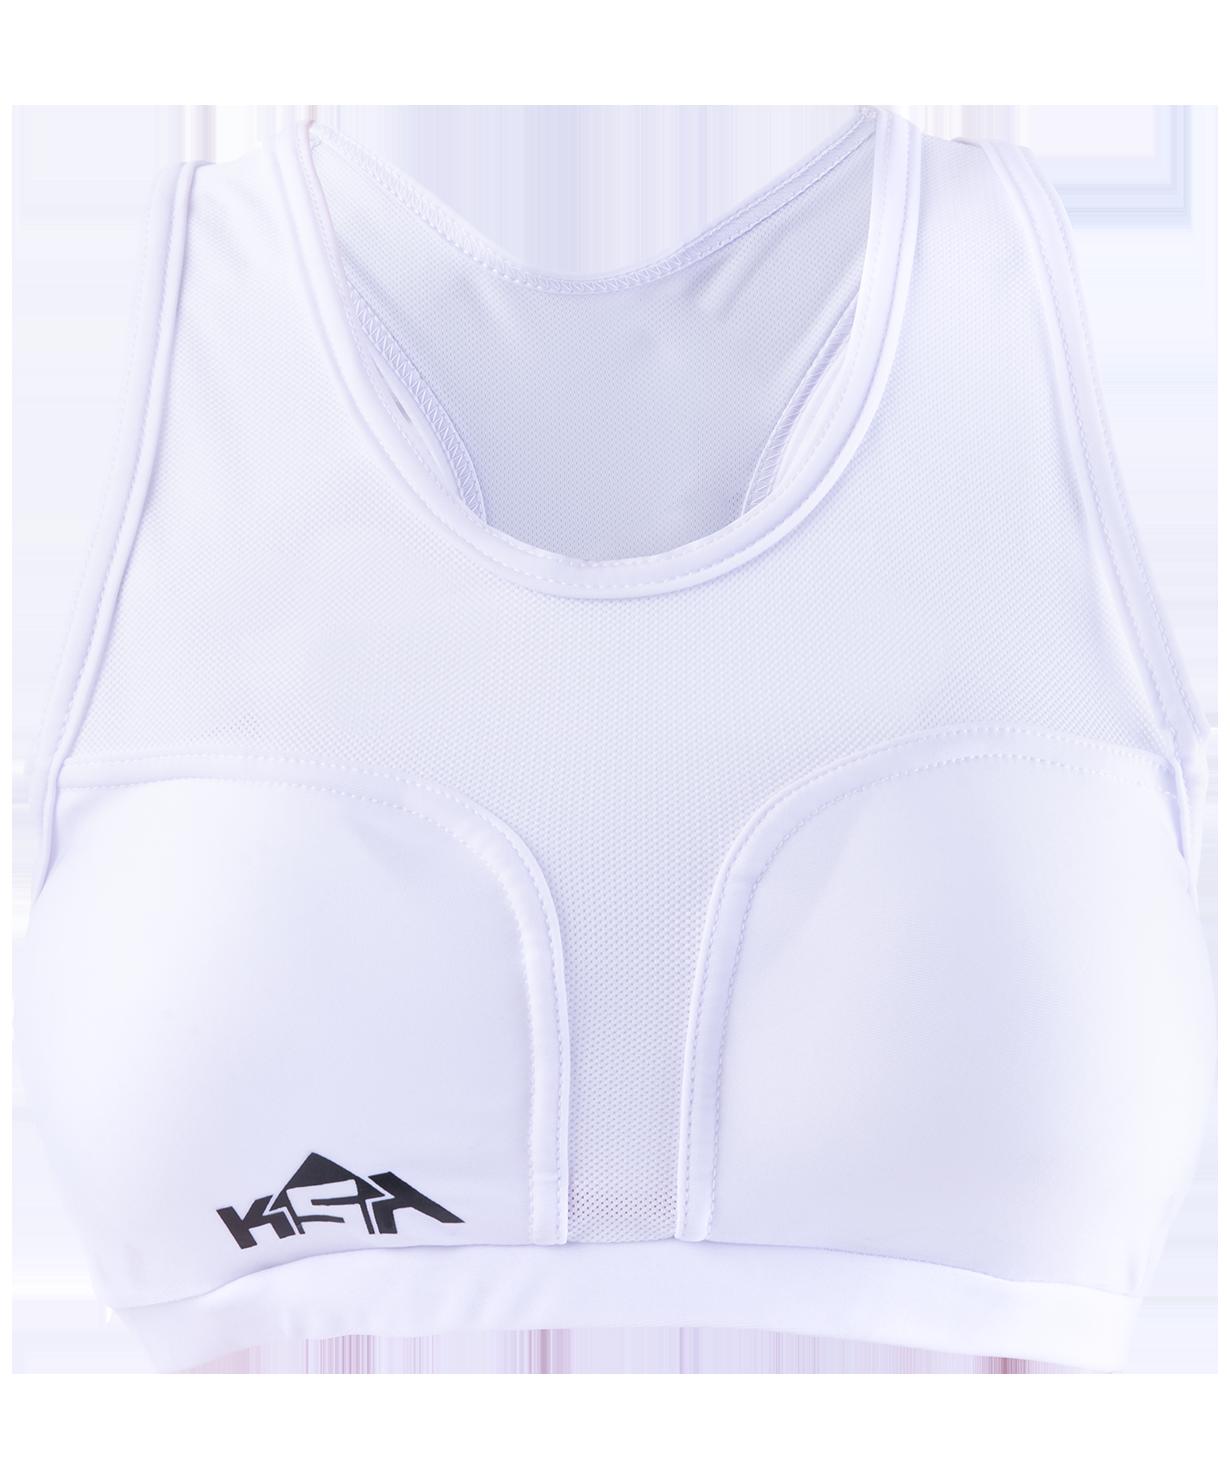 Специальная защита Защита груди Impulse KSA c40e2293b7de901da036d137a02025c4.png